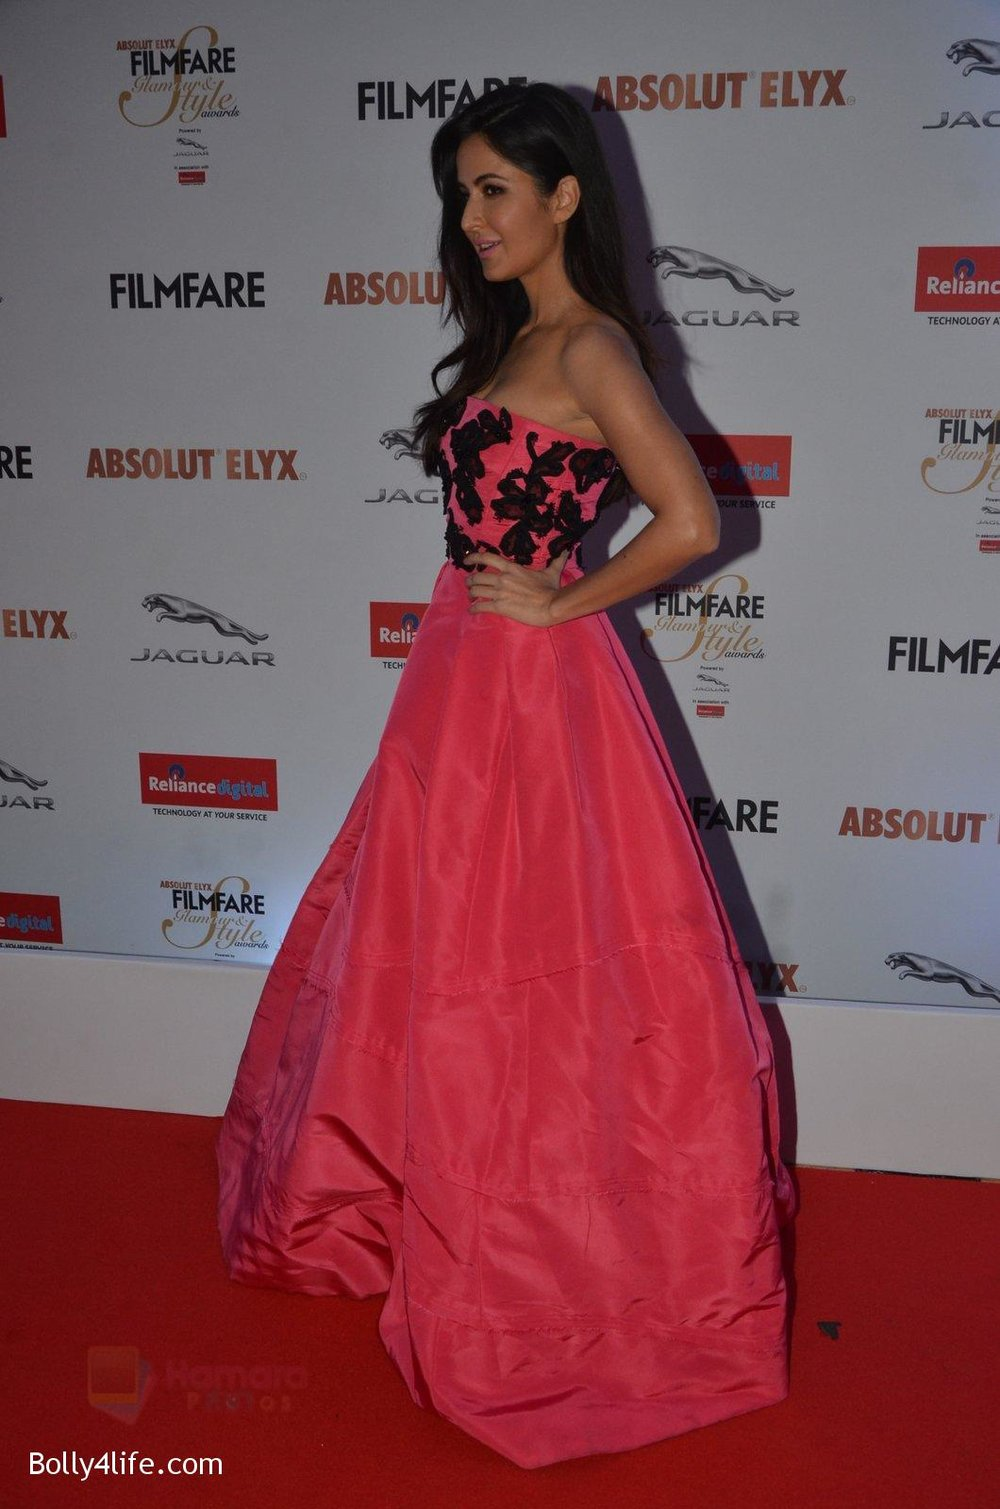 Katrina-Kaif-at-Filmfare-Glamour-Style-Awards-2016-in-Mumbai-on-15th-Oct-2016-1957.jpg